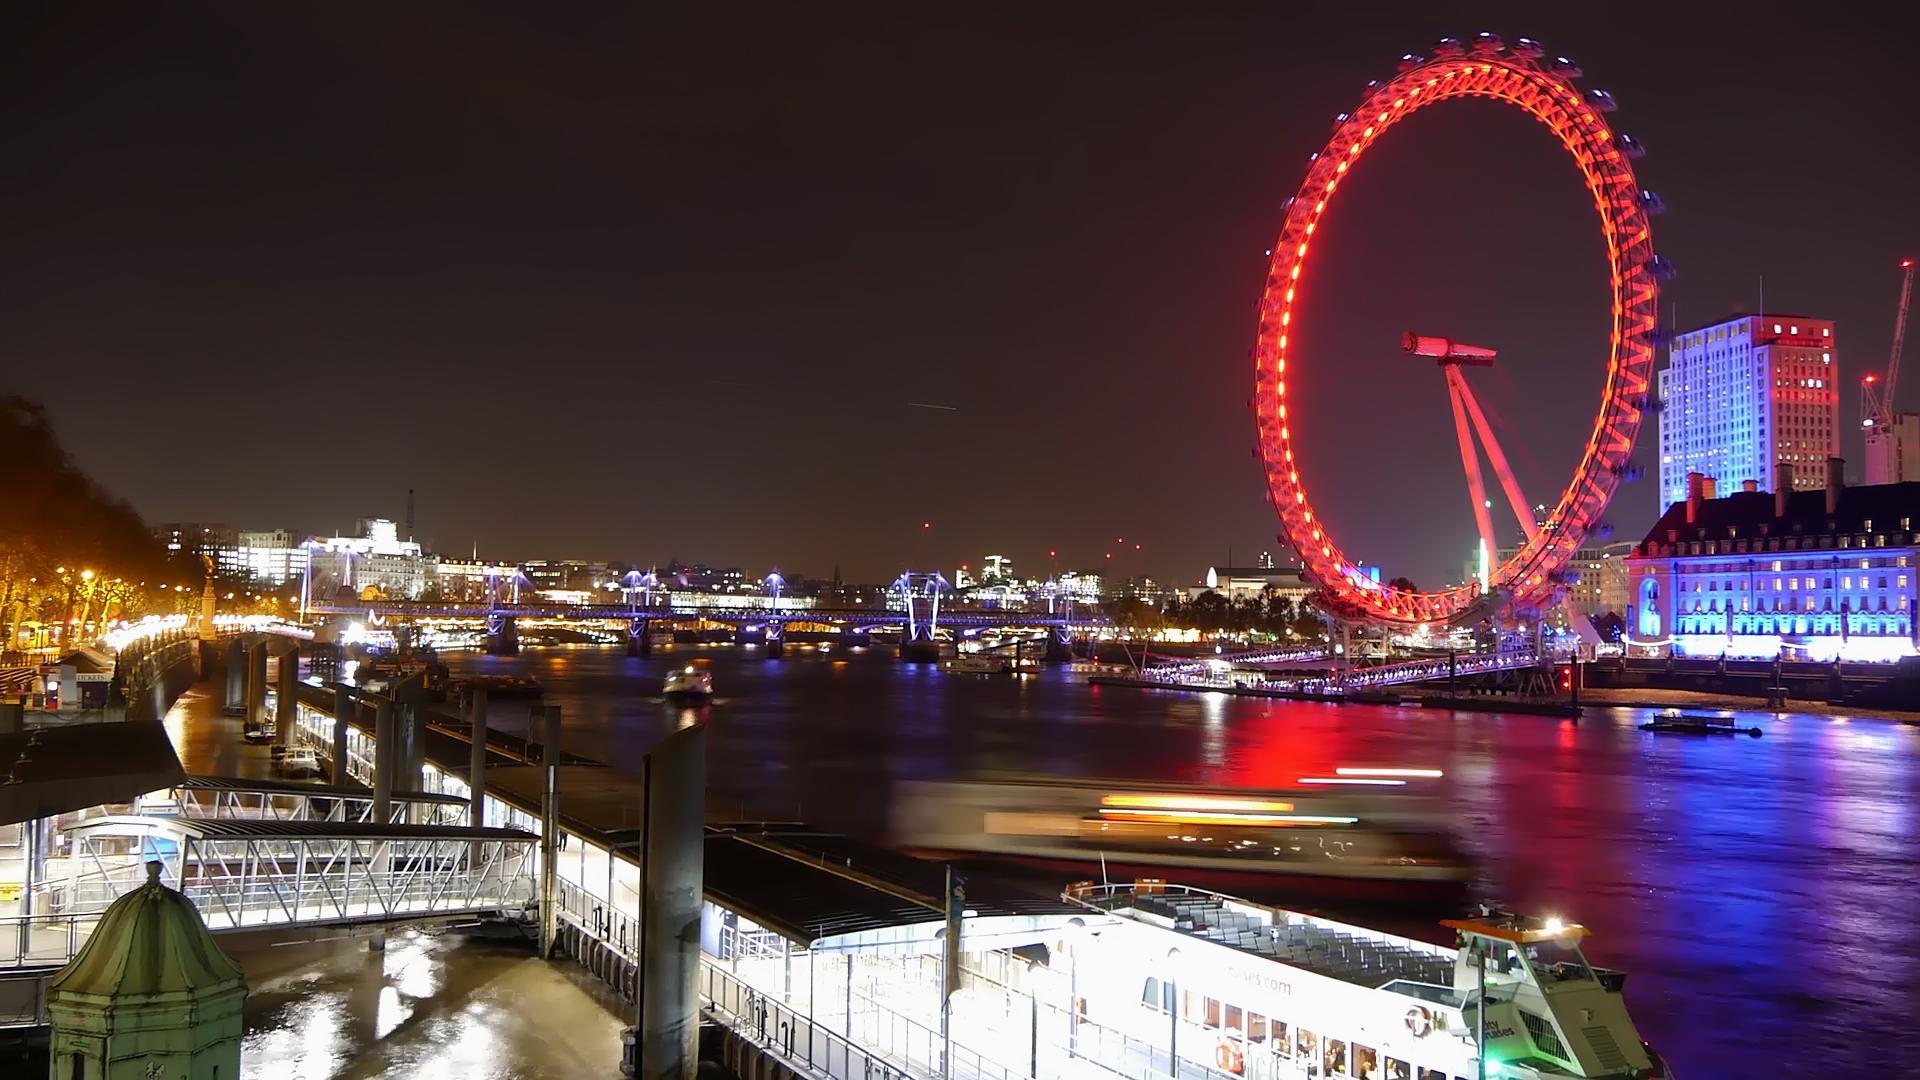 Timelapse 'London Eye and Big Ben'